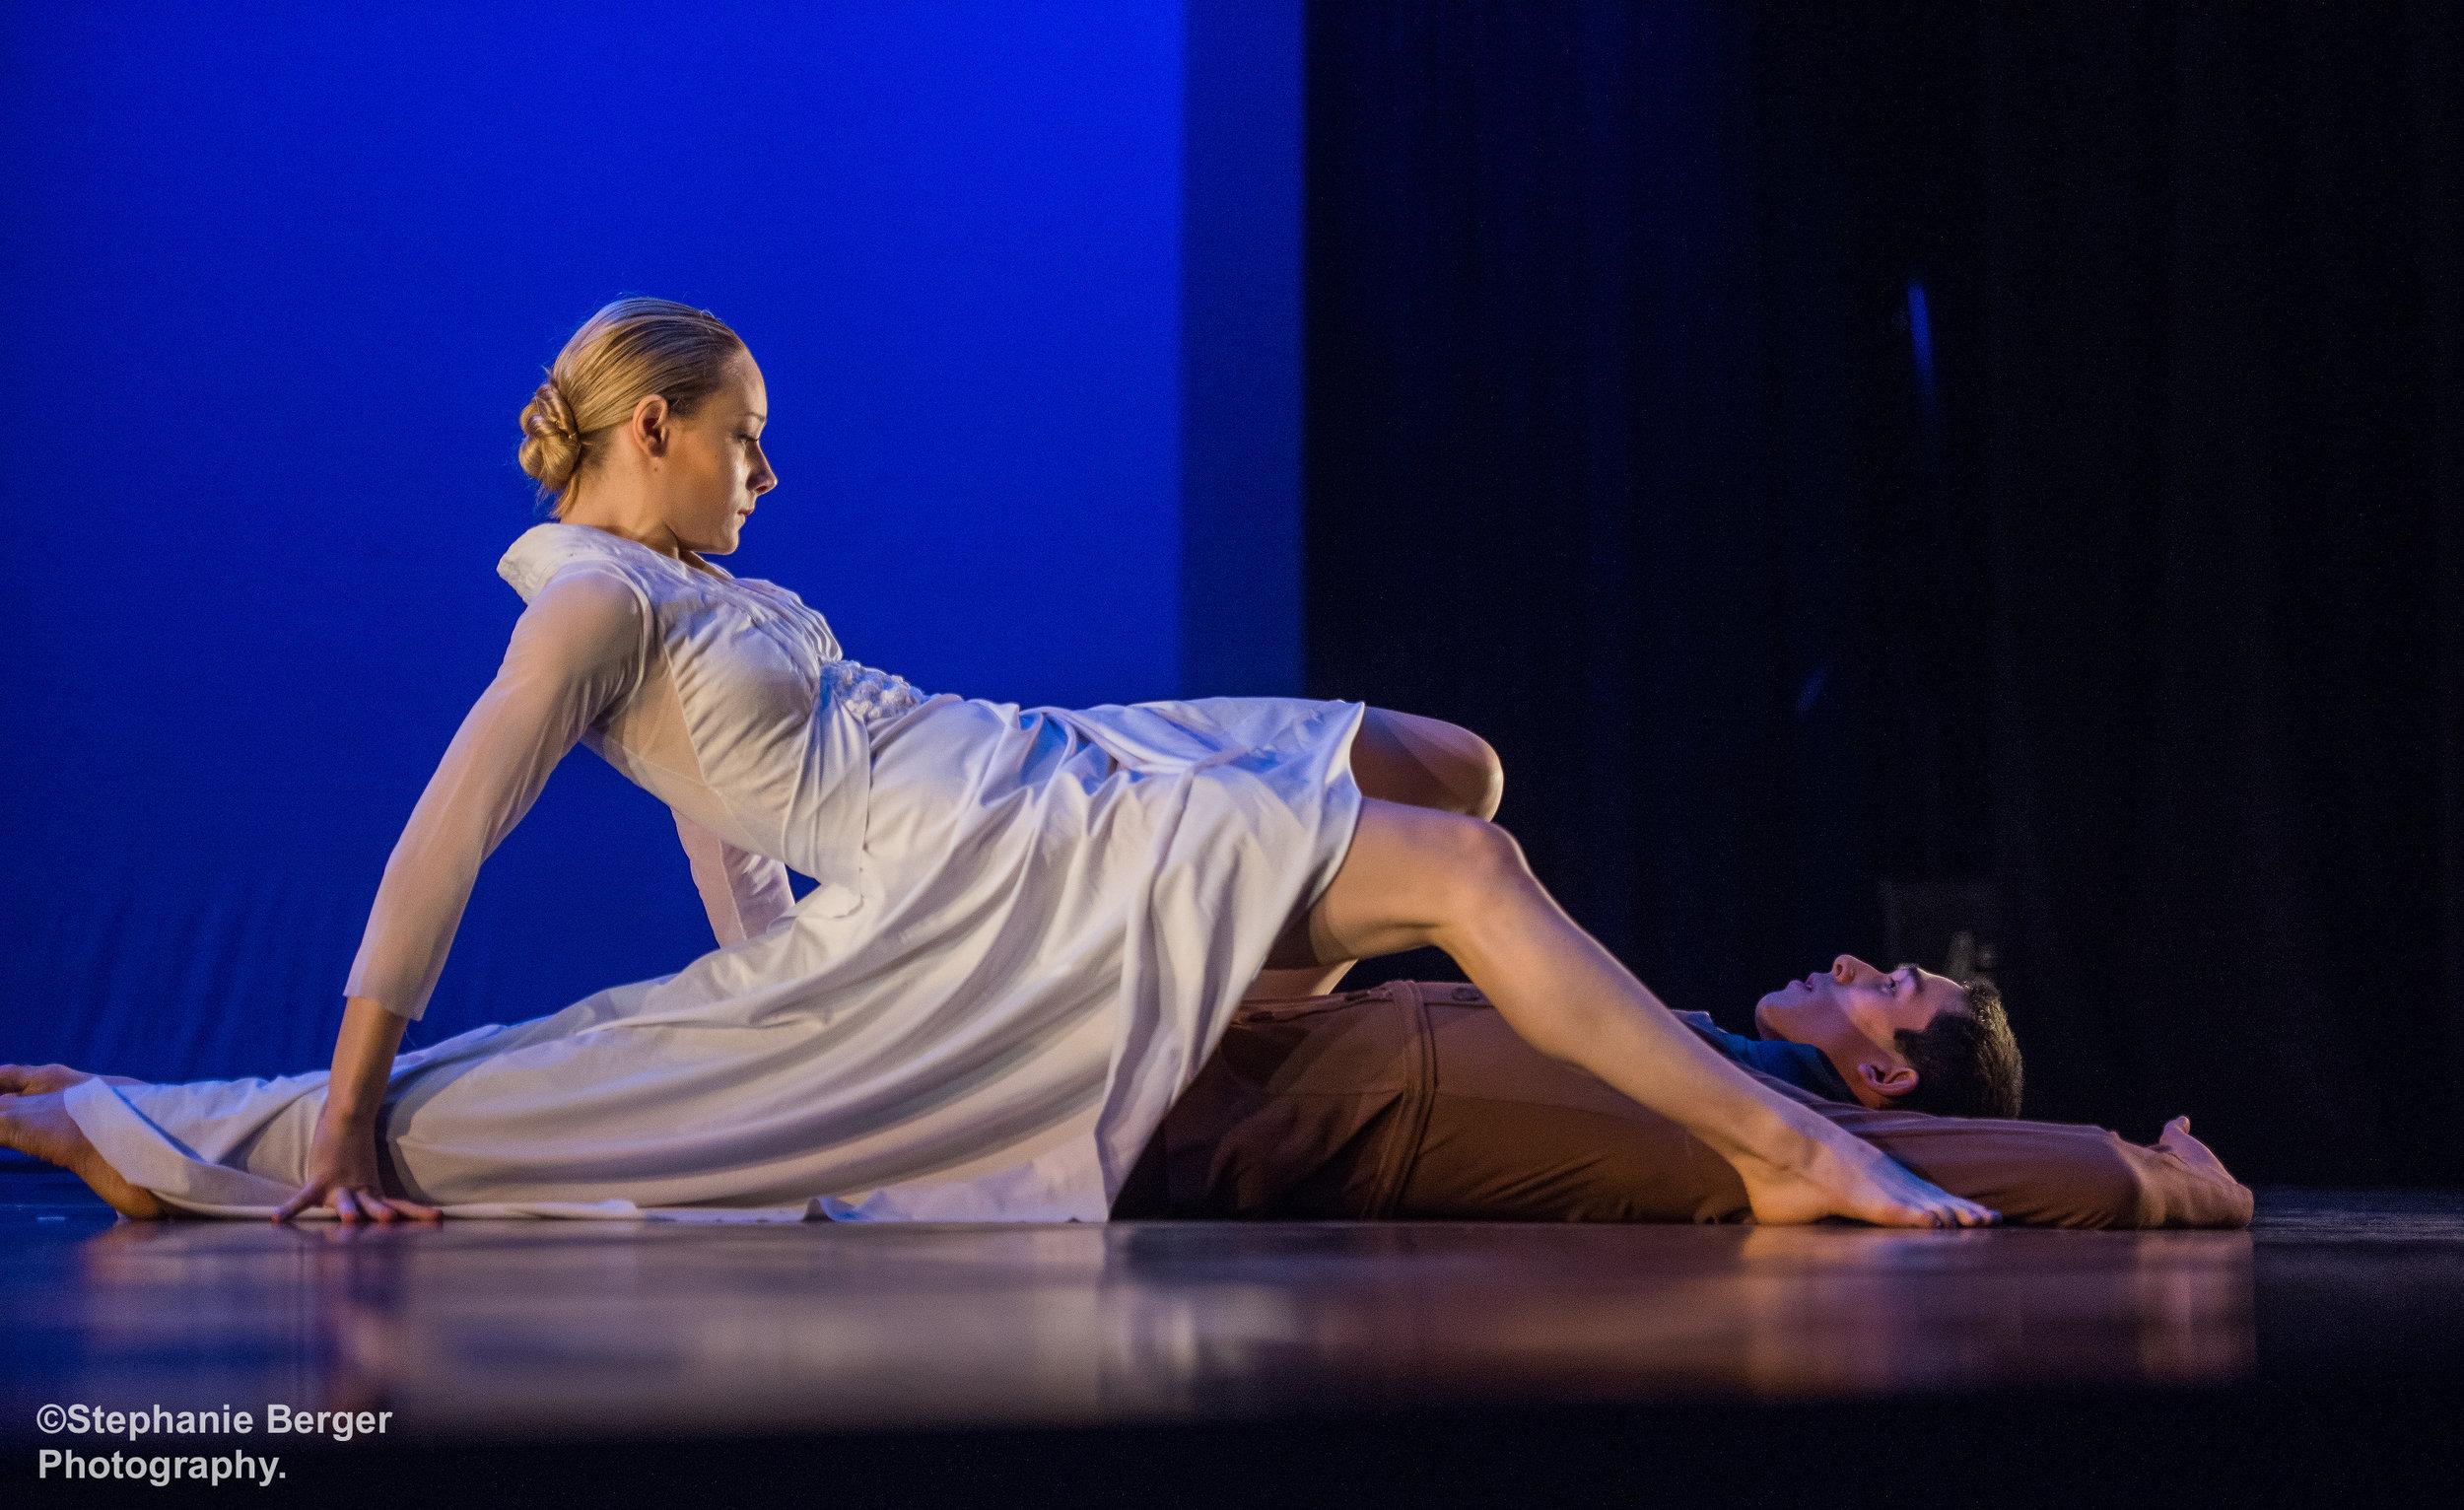 Charlotte Landreau, Jesse Obremski